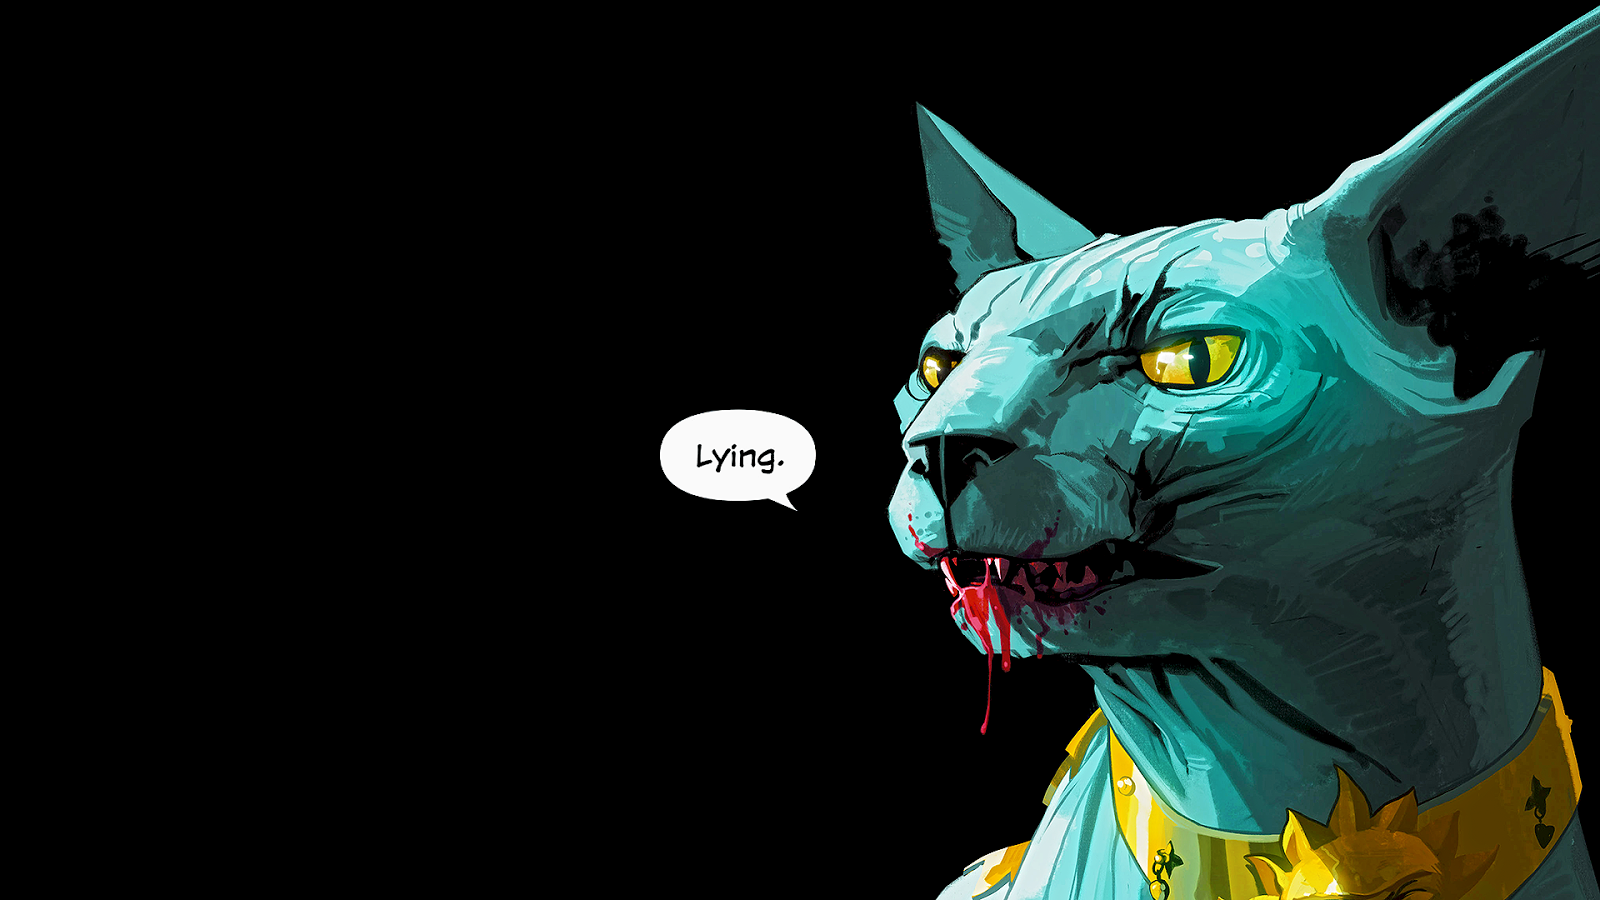 Saga S Lying Cat Is The Official Mascot Of 2017 Kotaku